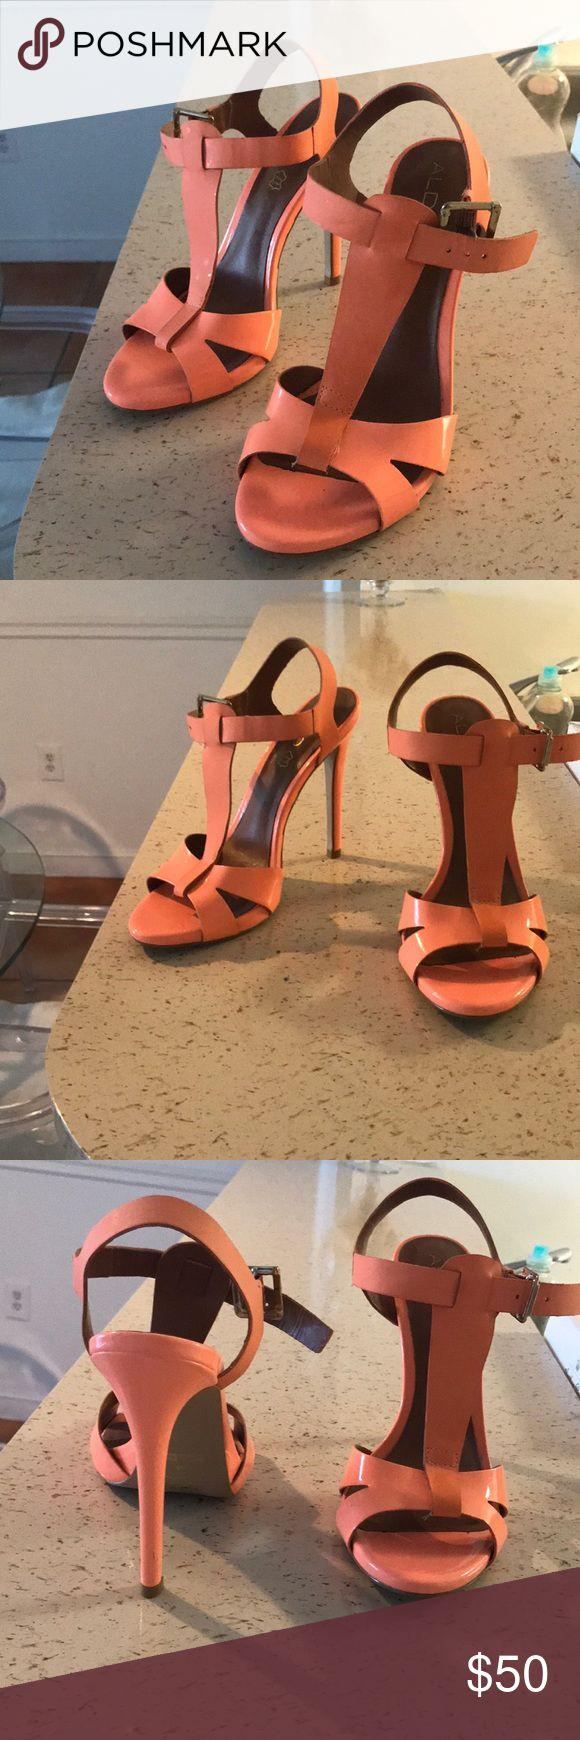 Neon strappy heel Neon orange strappy high heels Aldo Shoes Sandals